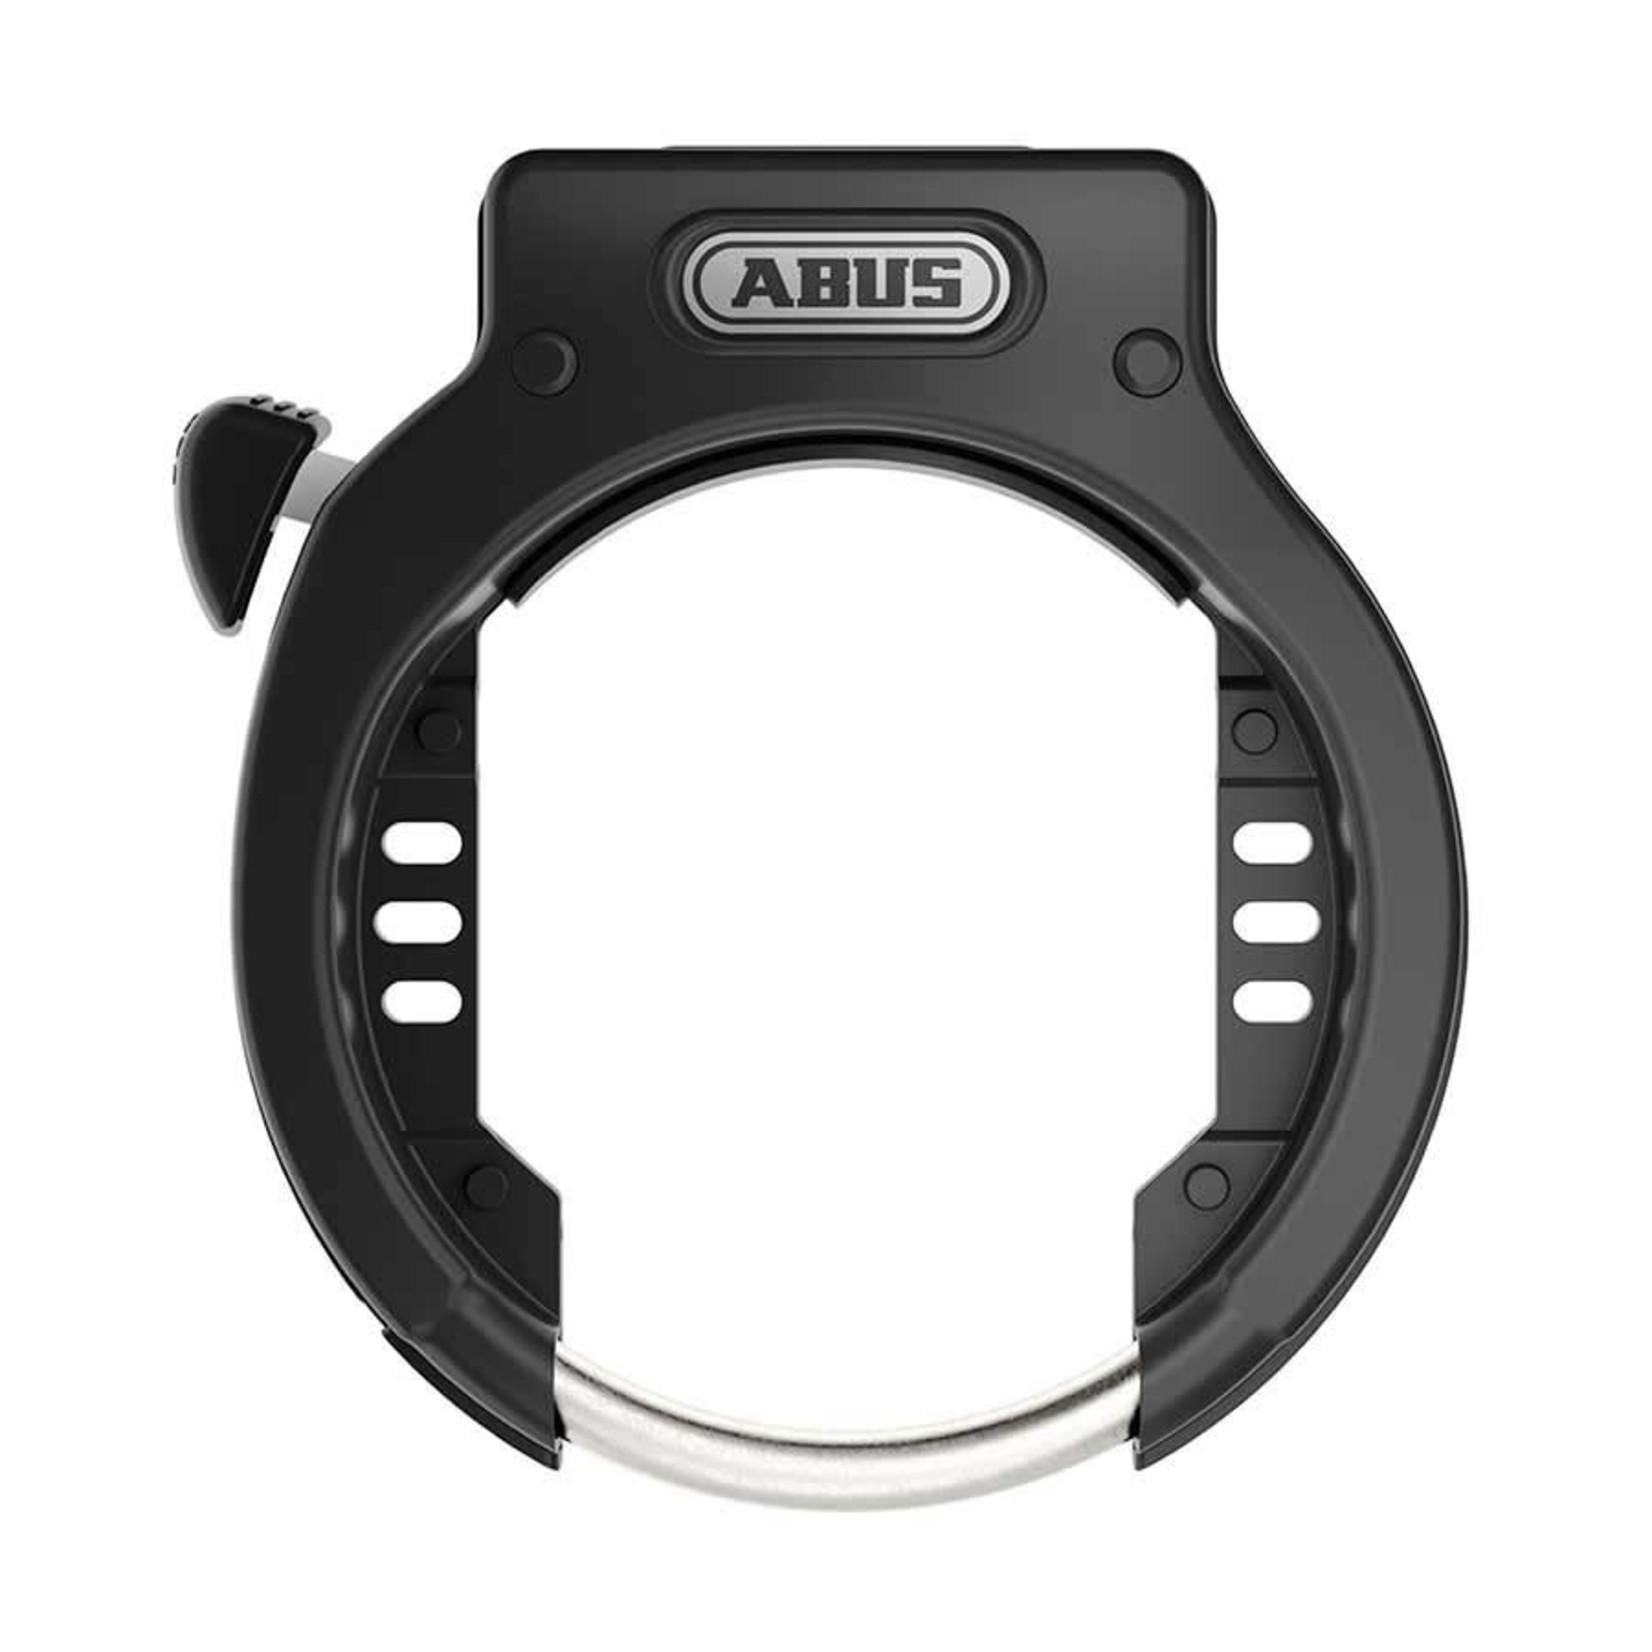 Abus Abus 4650XL Frame Lock